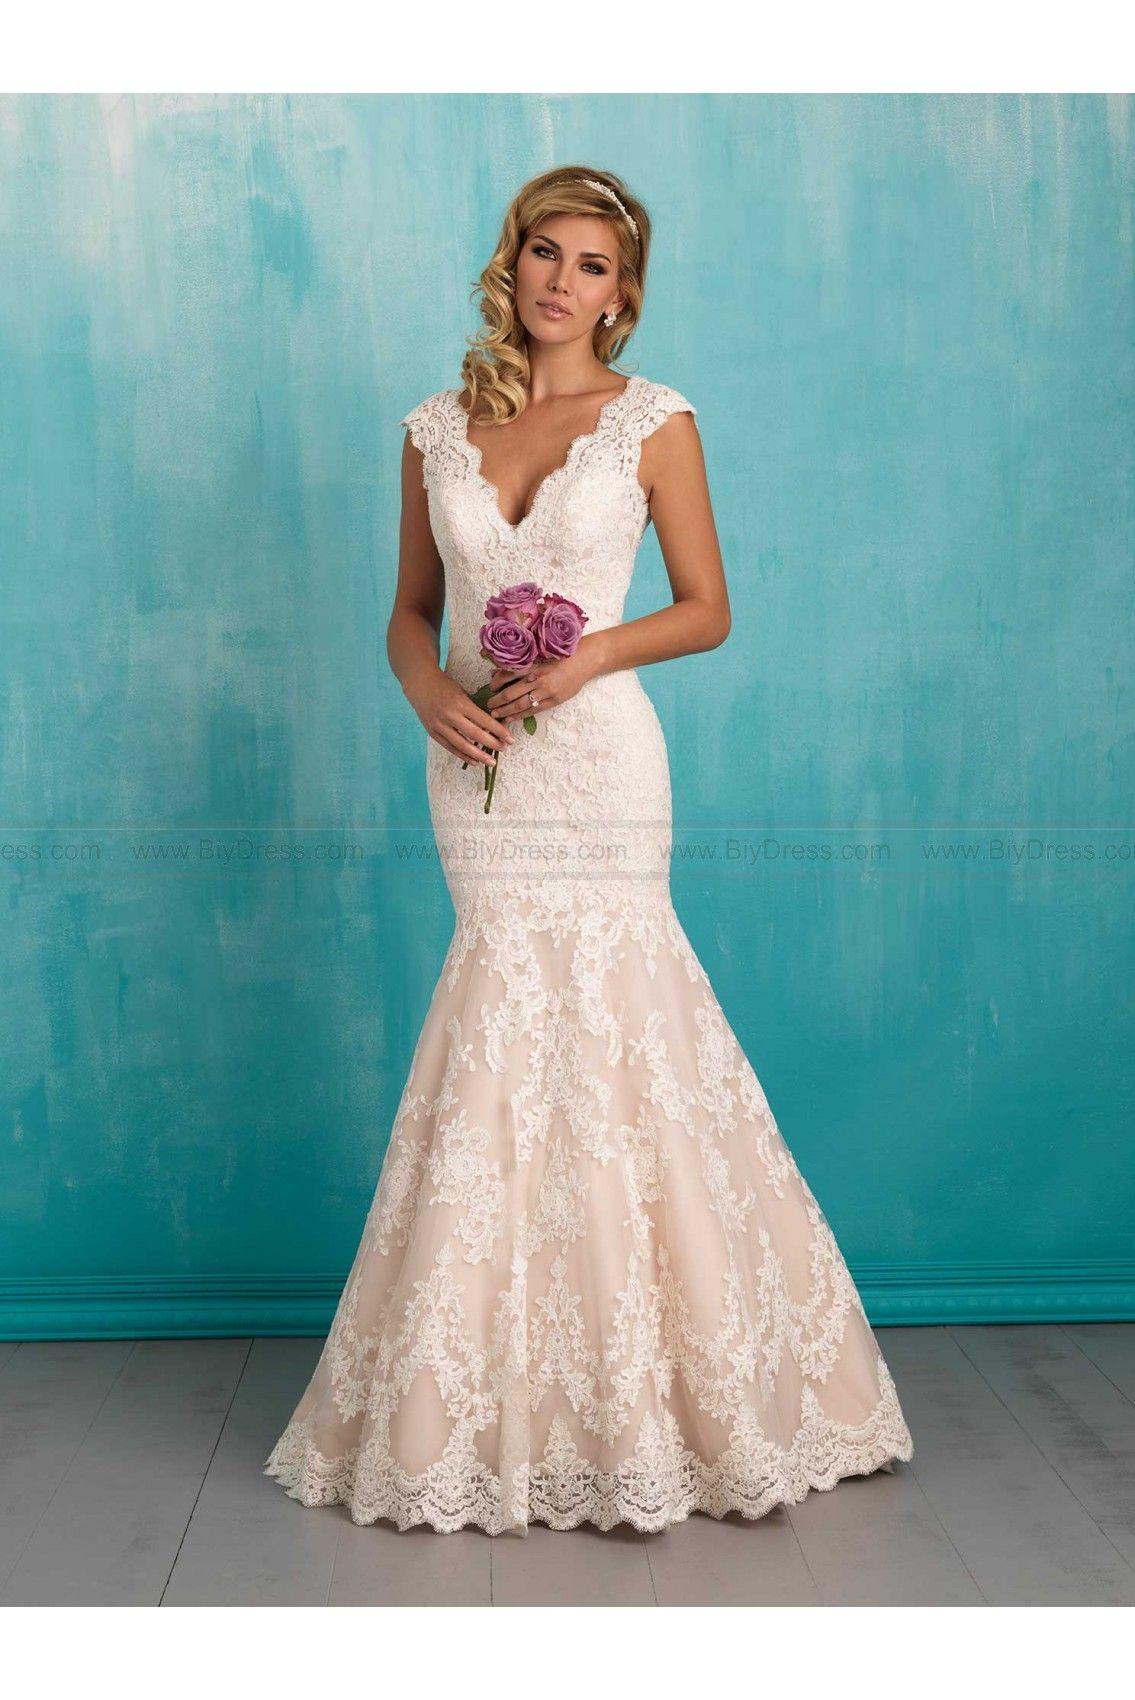 Allure Bridals Wedding Dress Style 9320   allure bridal 2016 ...